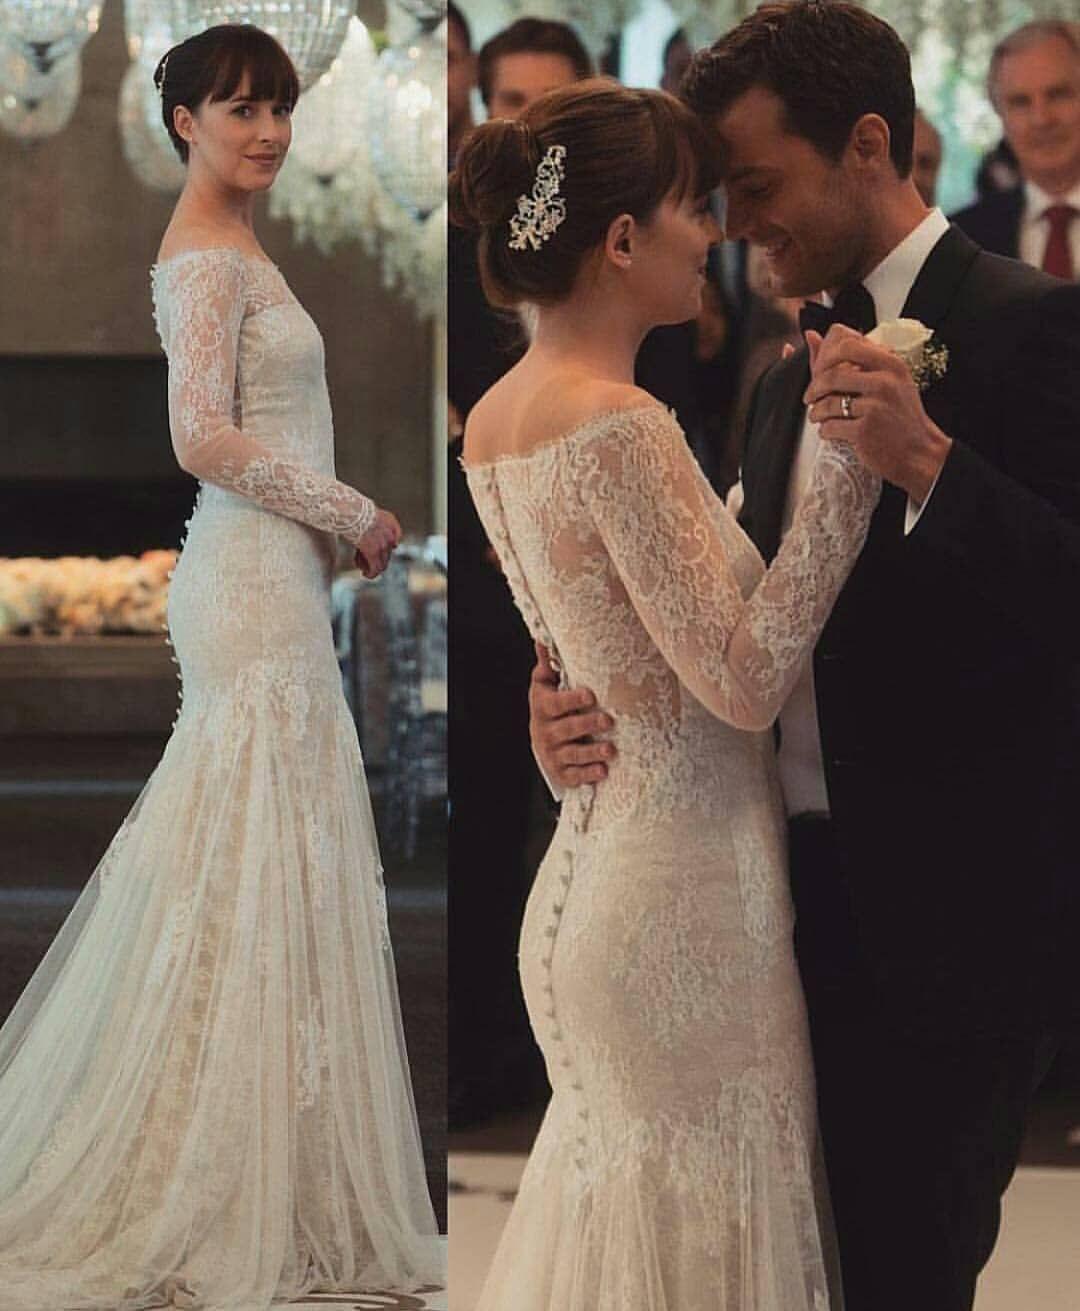 The World Of Dresses On Instagram Gorgeous Follow Elbisedunyamm Follow Elbis Grey Wedding Dress Indian Wedding Gowns Designer Bridal Gowns [ 1311 x 1080 Pixel ]